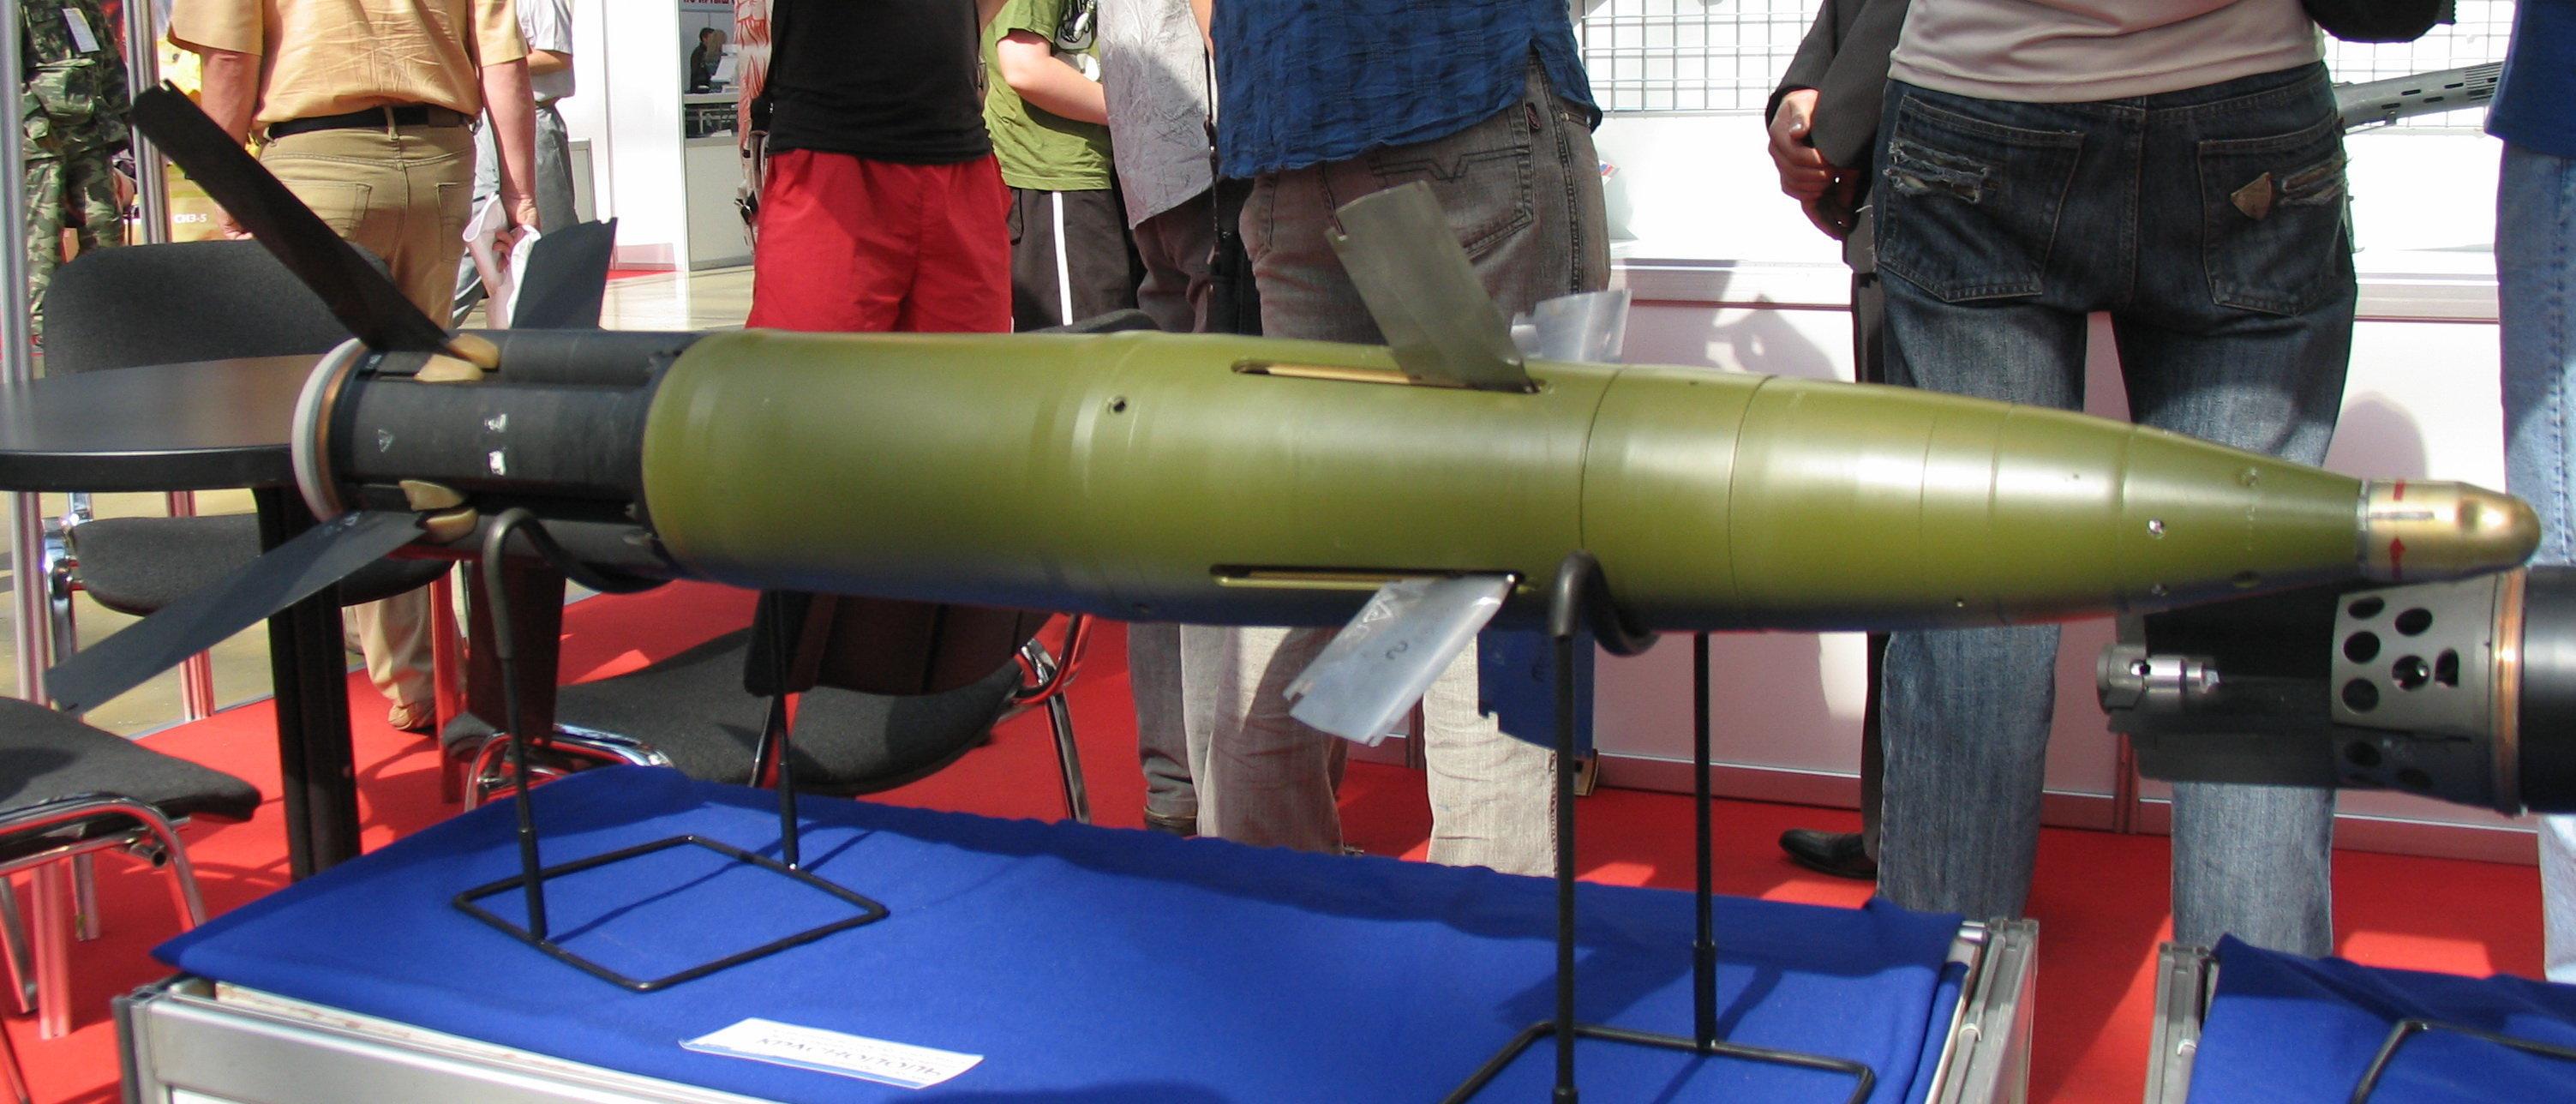 Granata di artiglieria guidata Krasnopol